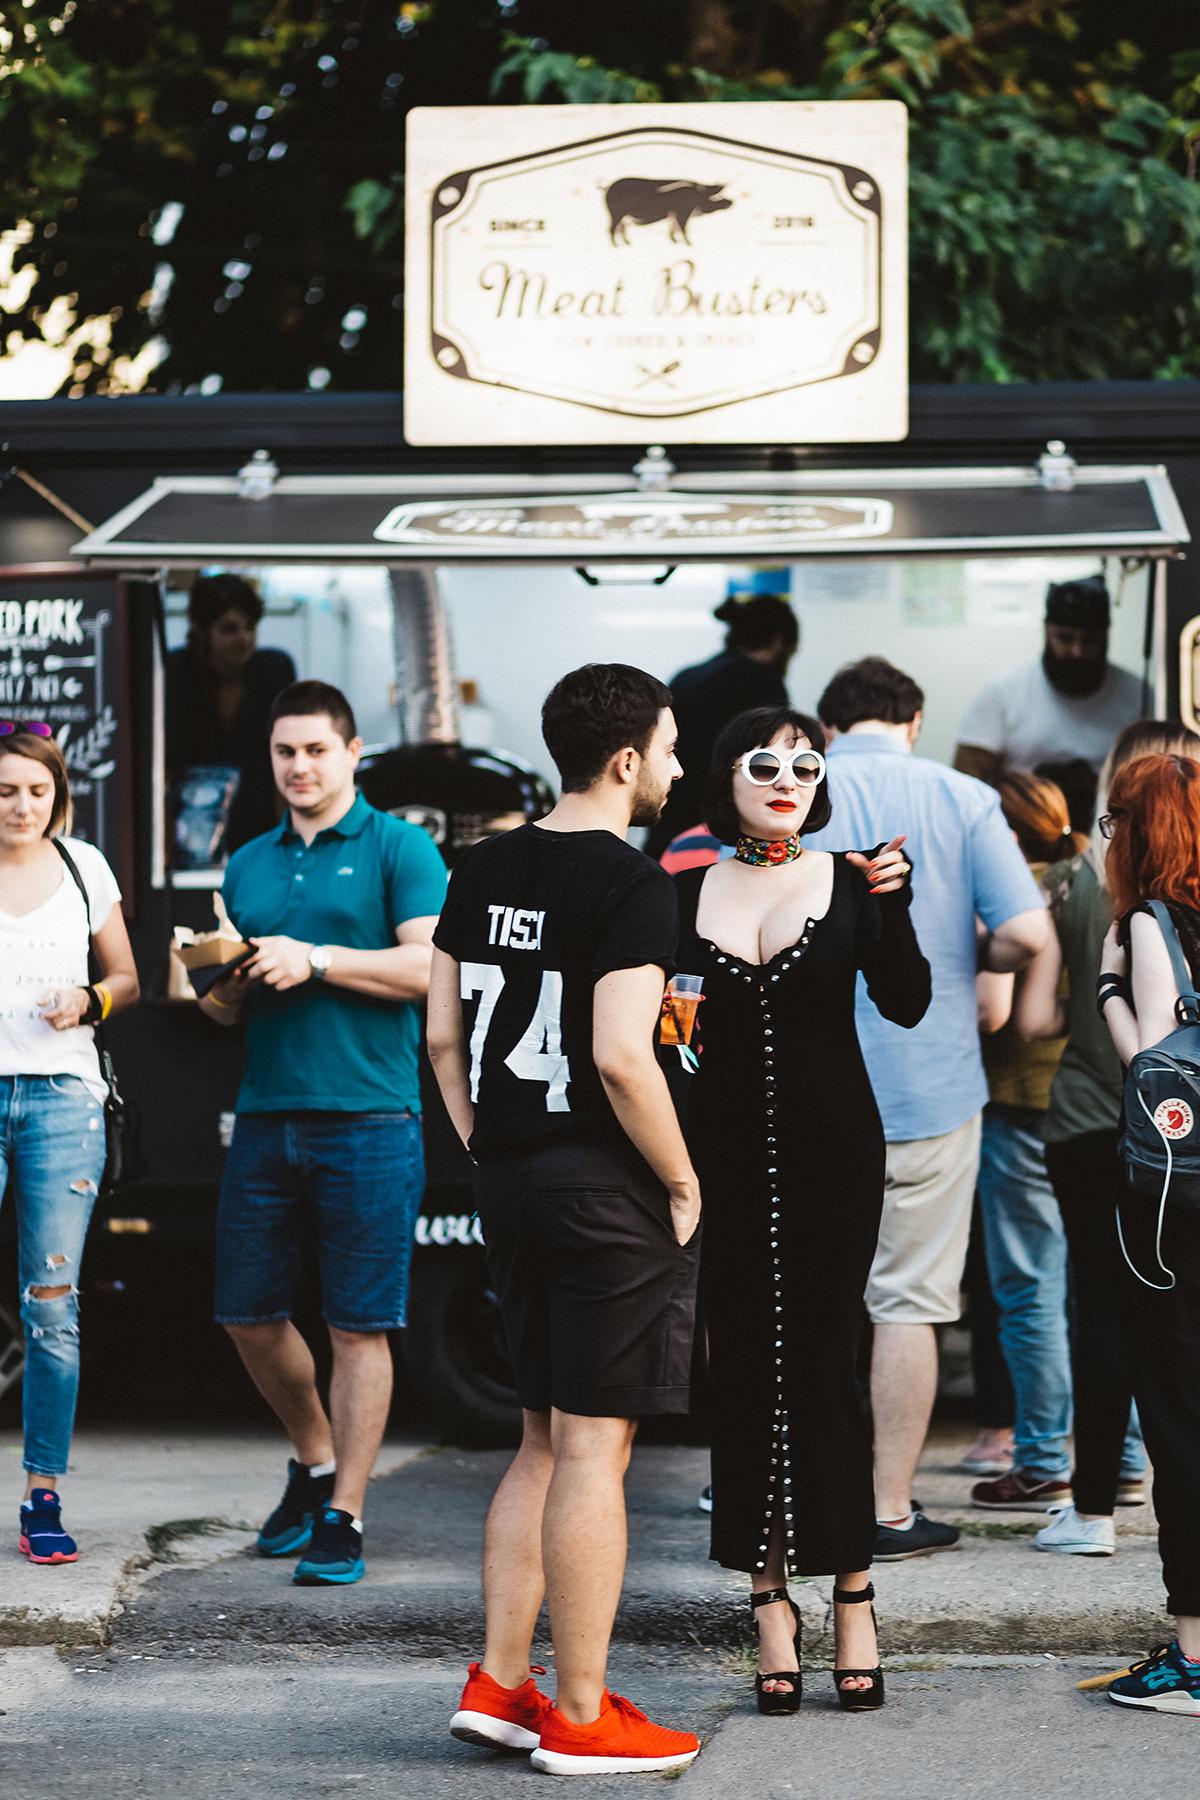 ana-morodan-street-food-festival-9